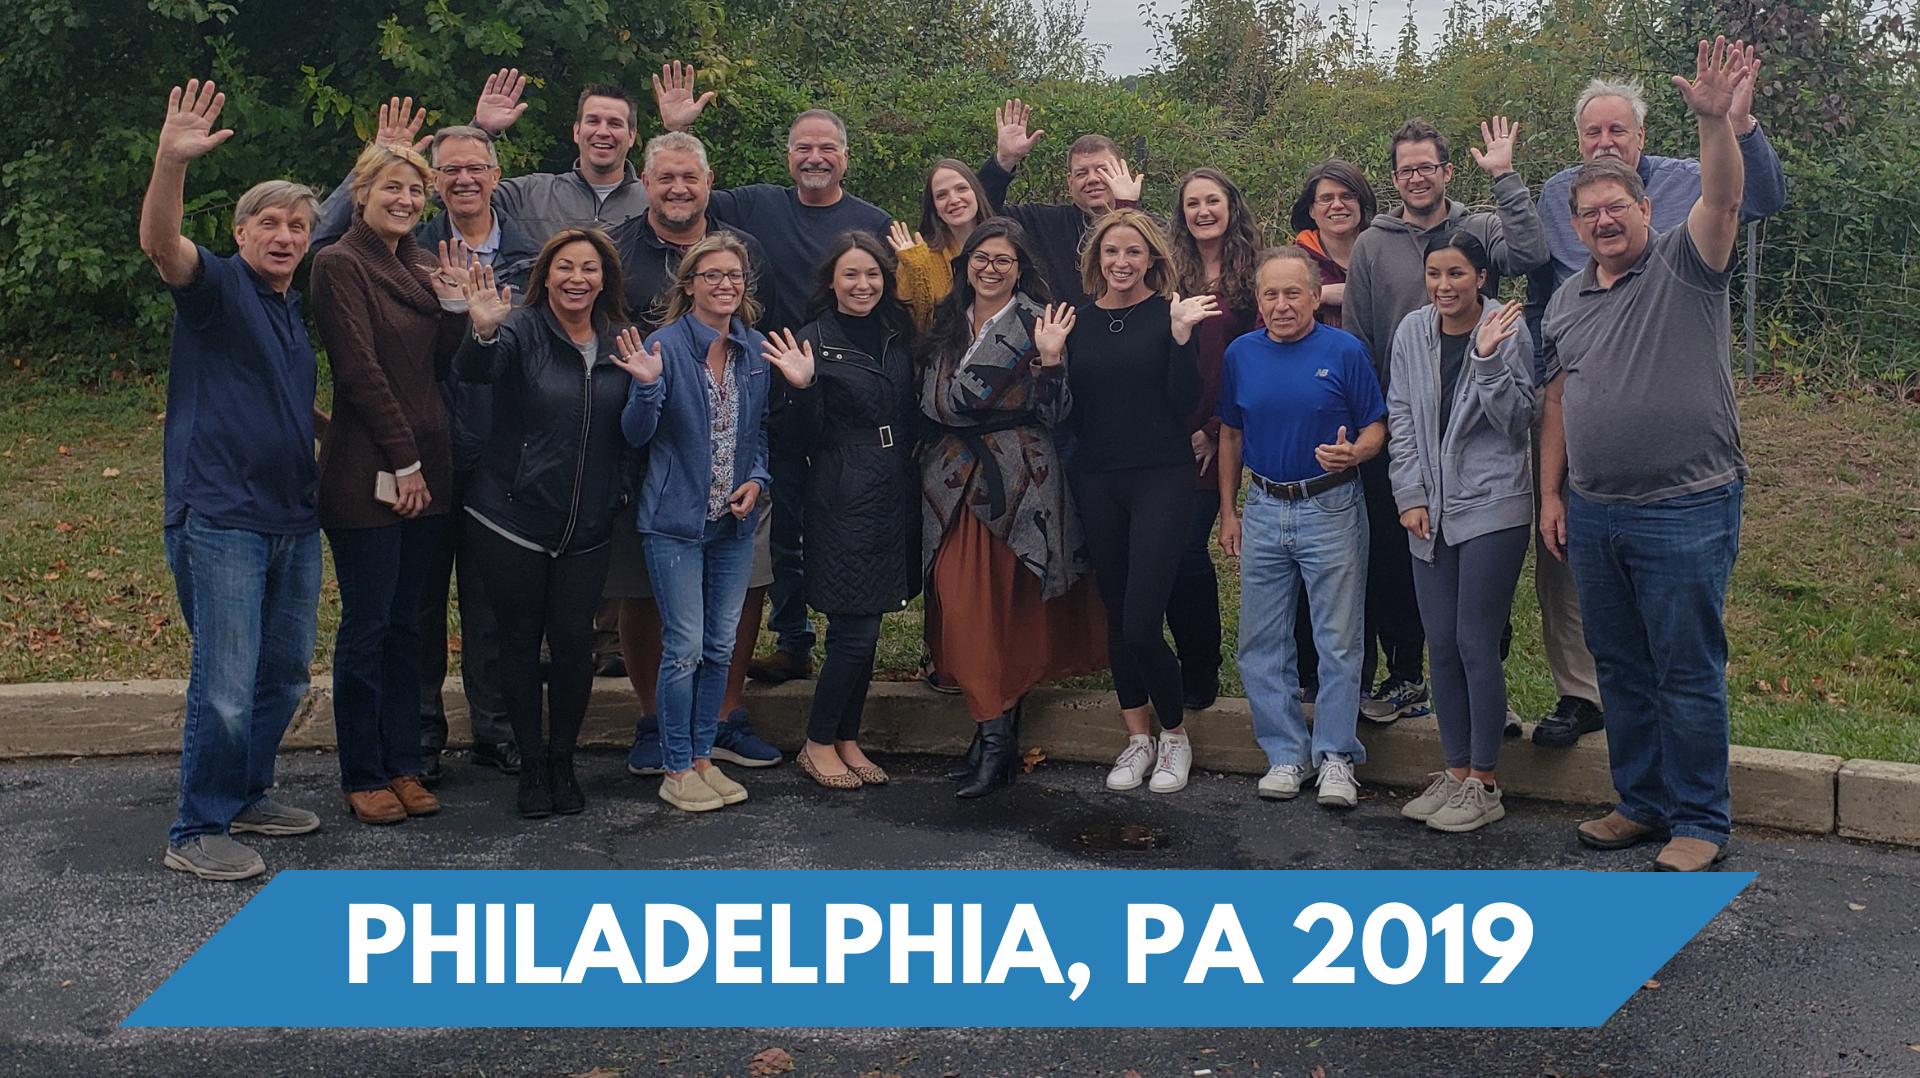 Chief Architect Training by Chief Experts Academy 2019 Philadelphia Training Class